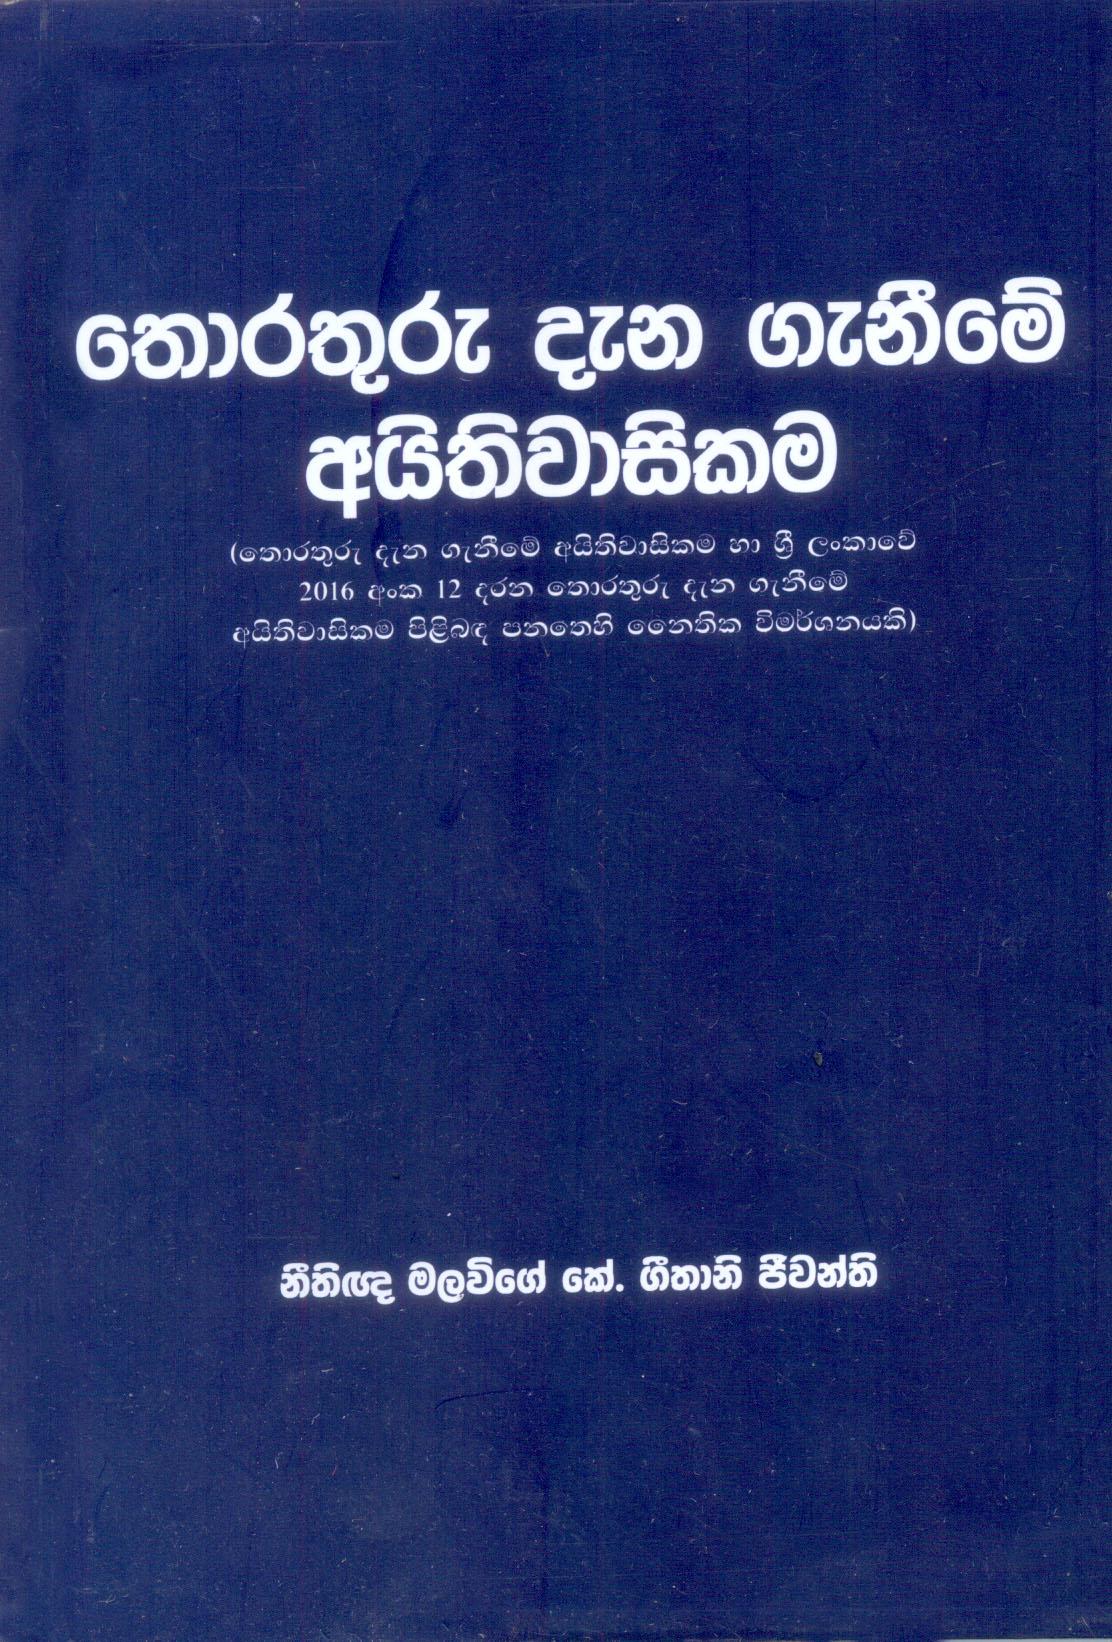 Thorathuru Dana Ganeeme Aithiwasikama